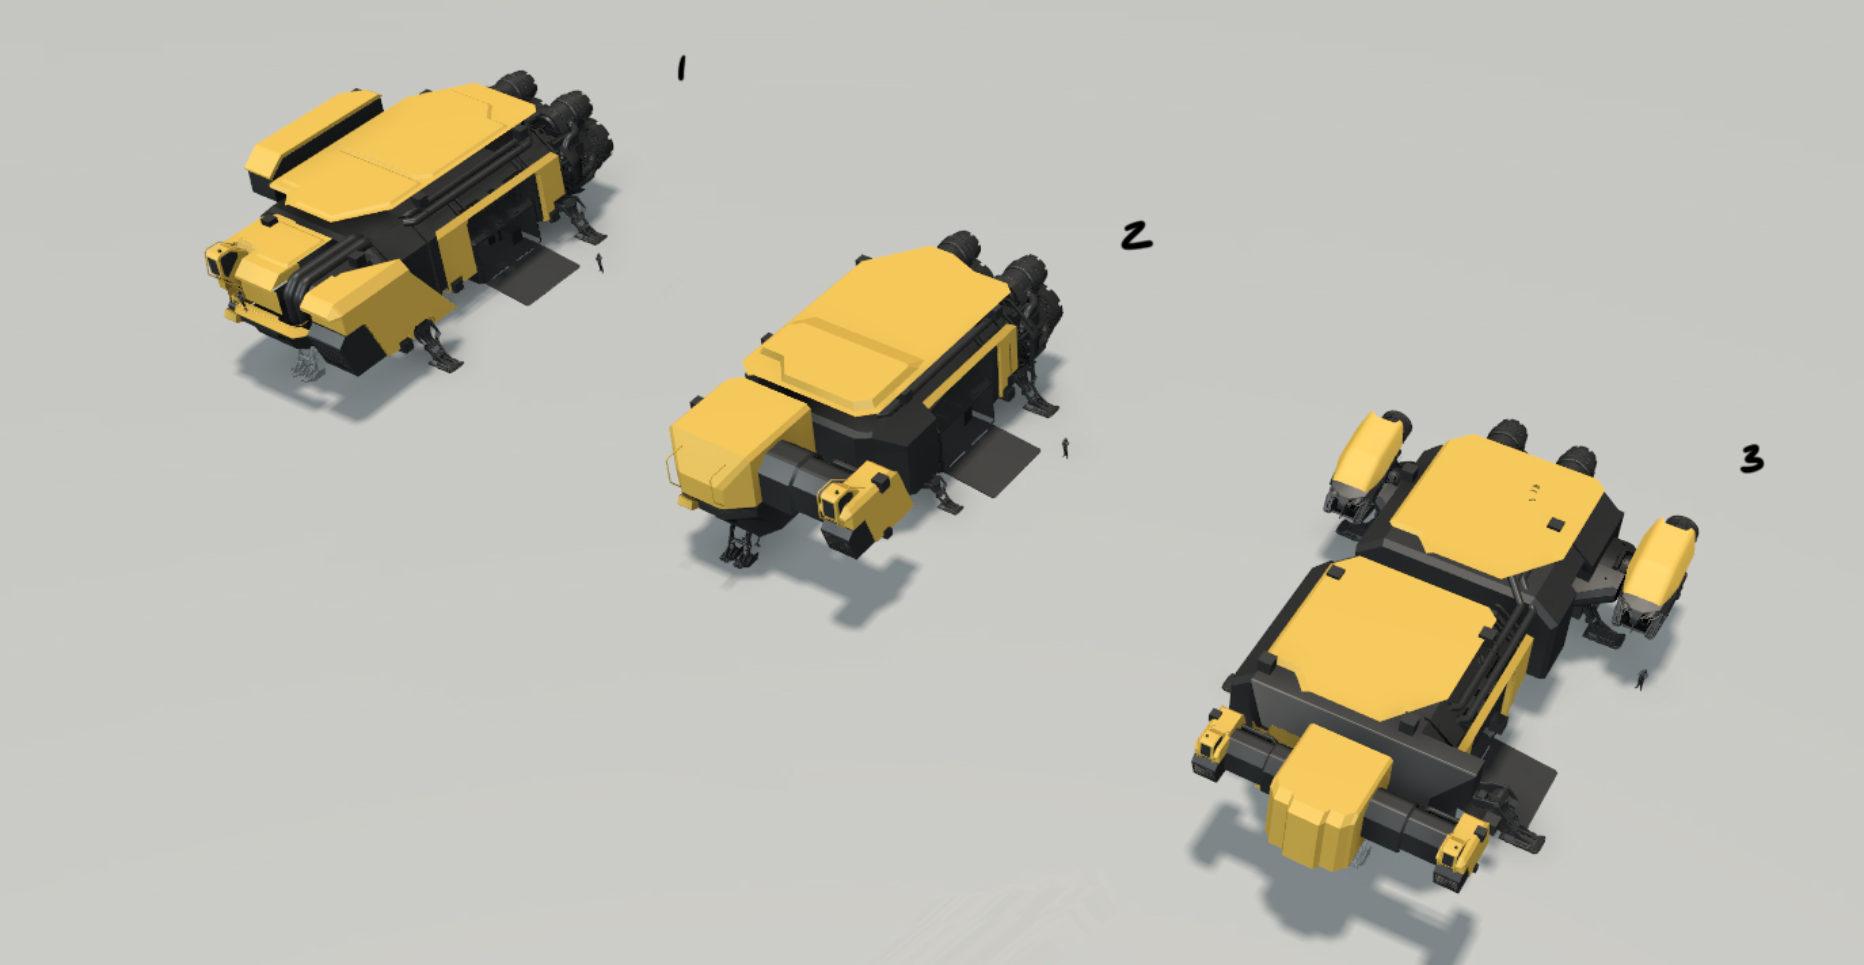 SC-Vulture-Vault-Concept-A-9.jpg